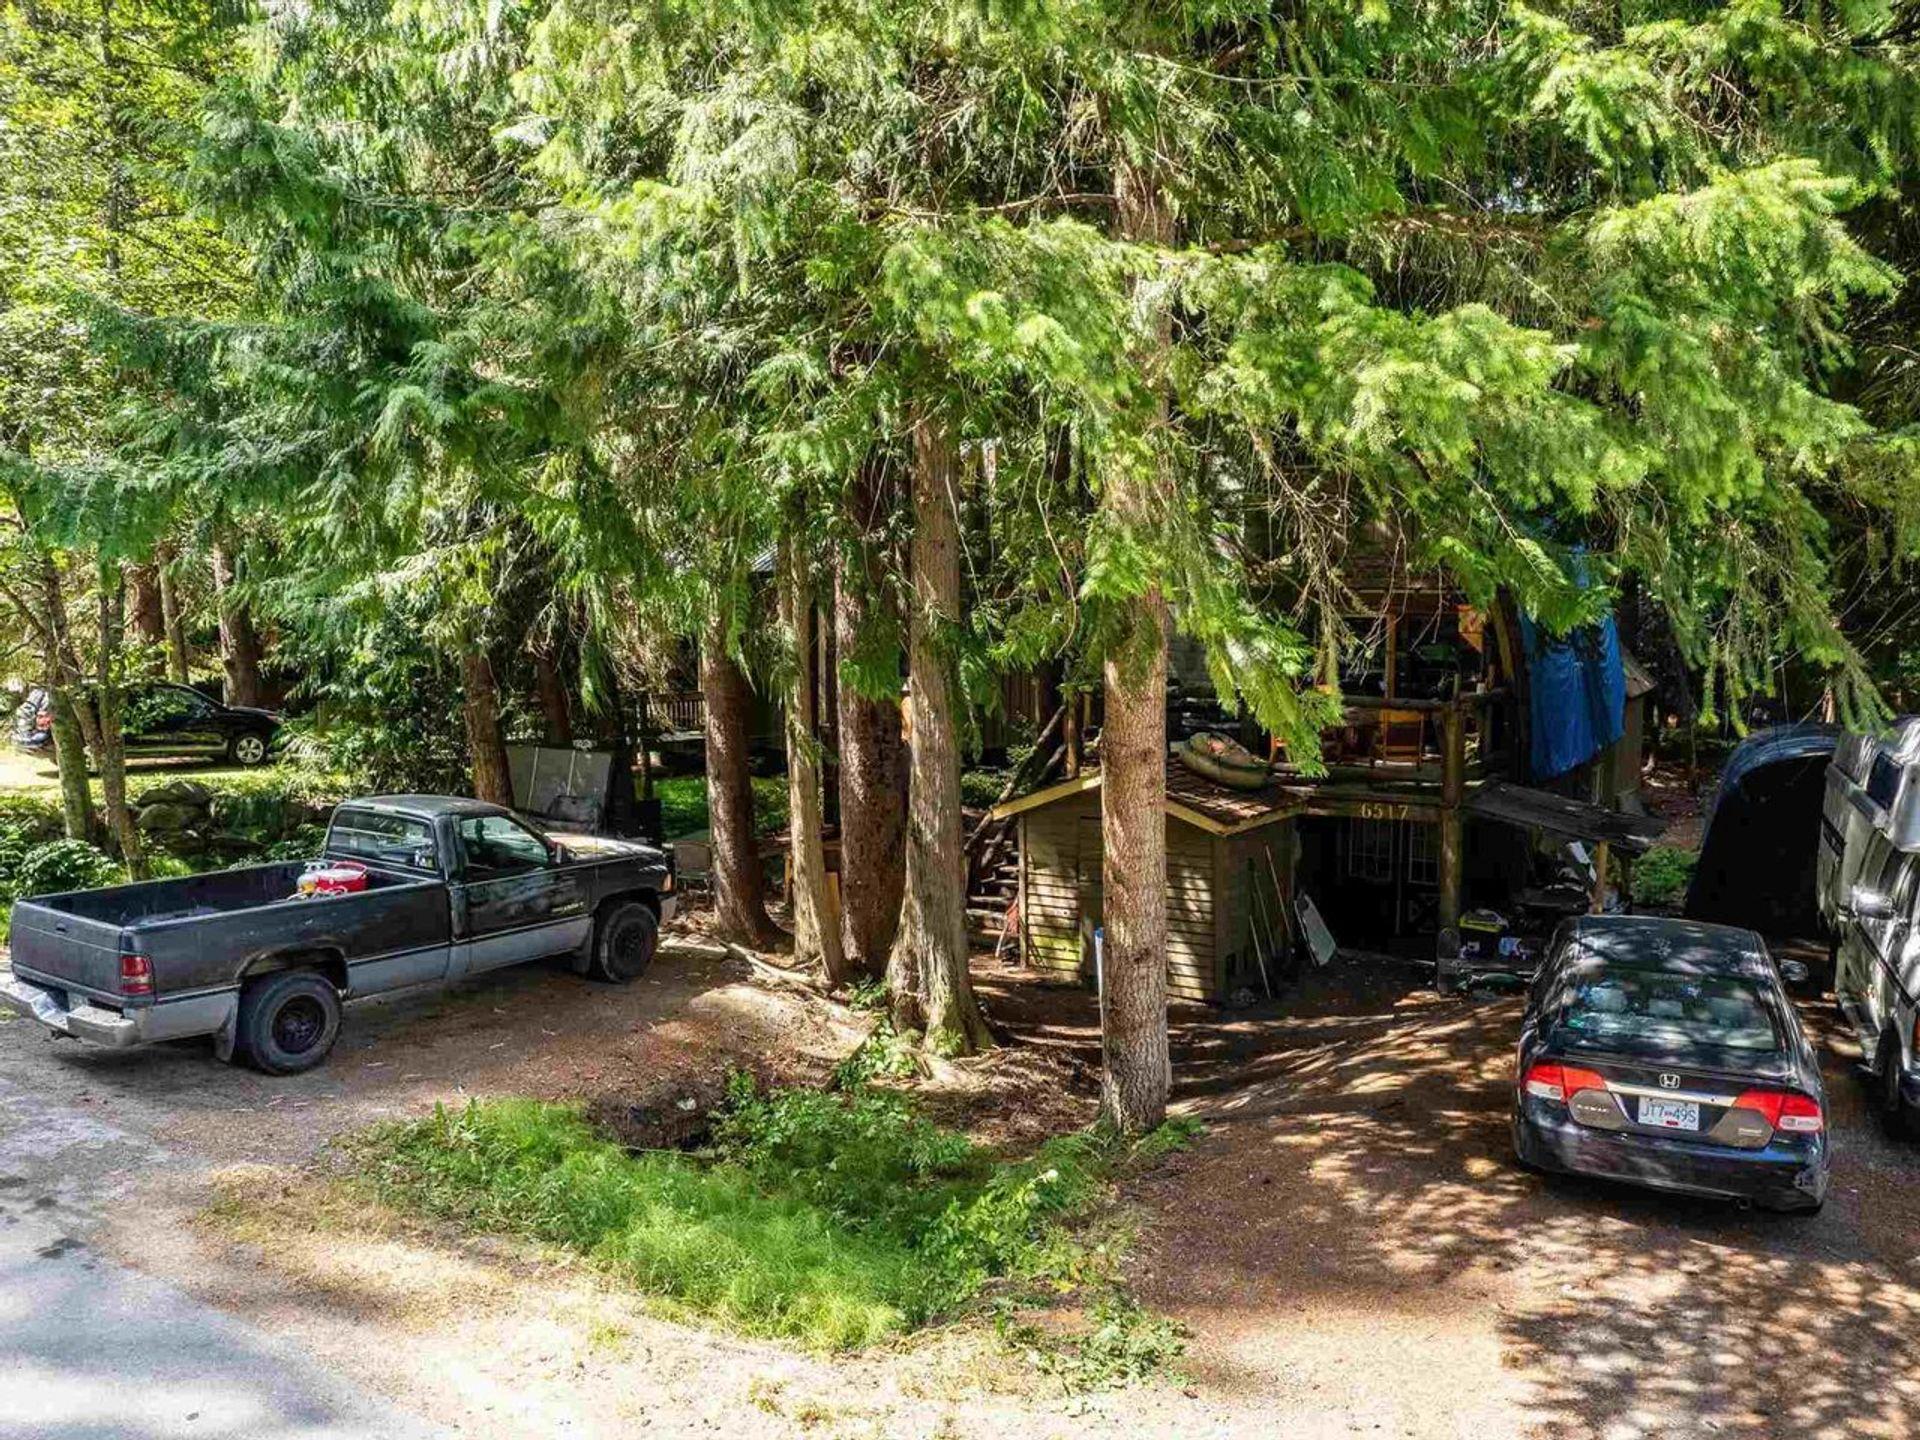 6517-balsam-way-whistler-cay-estates-whistler-18 at 6517 Balsam Way, Whistler Cay Estates, Whistler